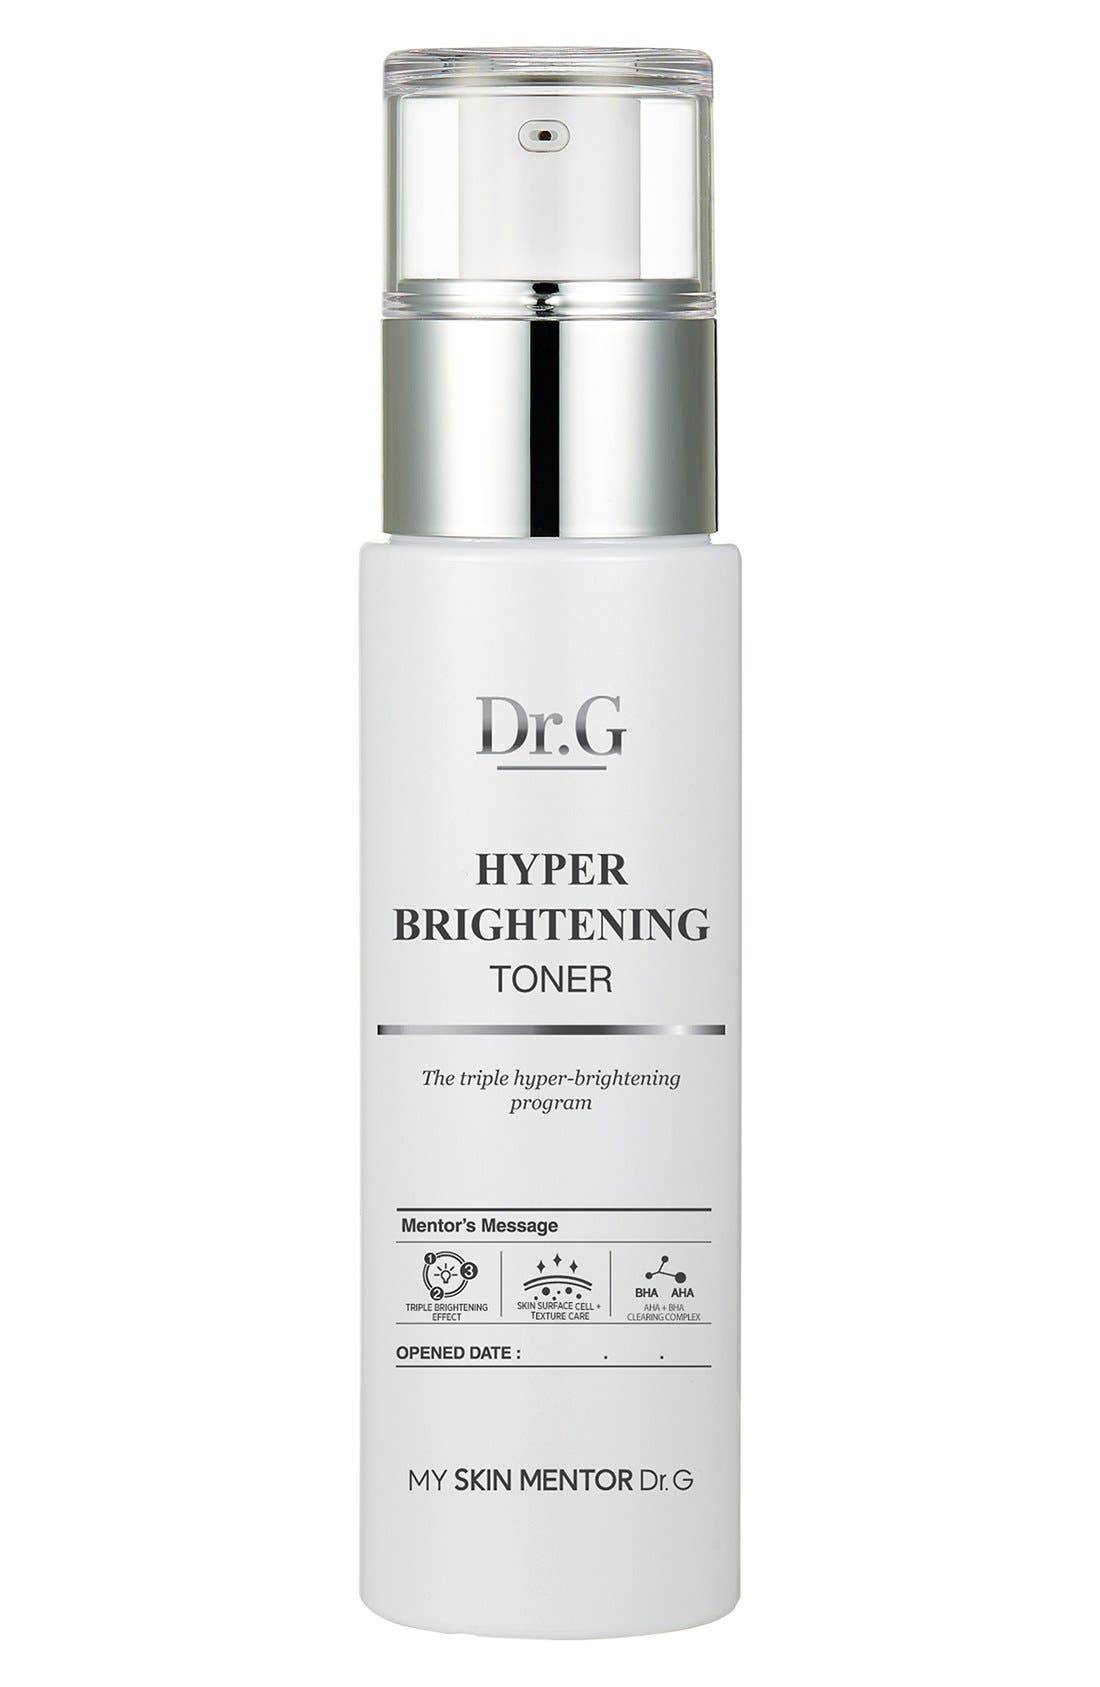 My Skin Mentor Dr. G Beauty Hyper Brightening Toner (Nordstrom Exclusive)